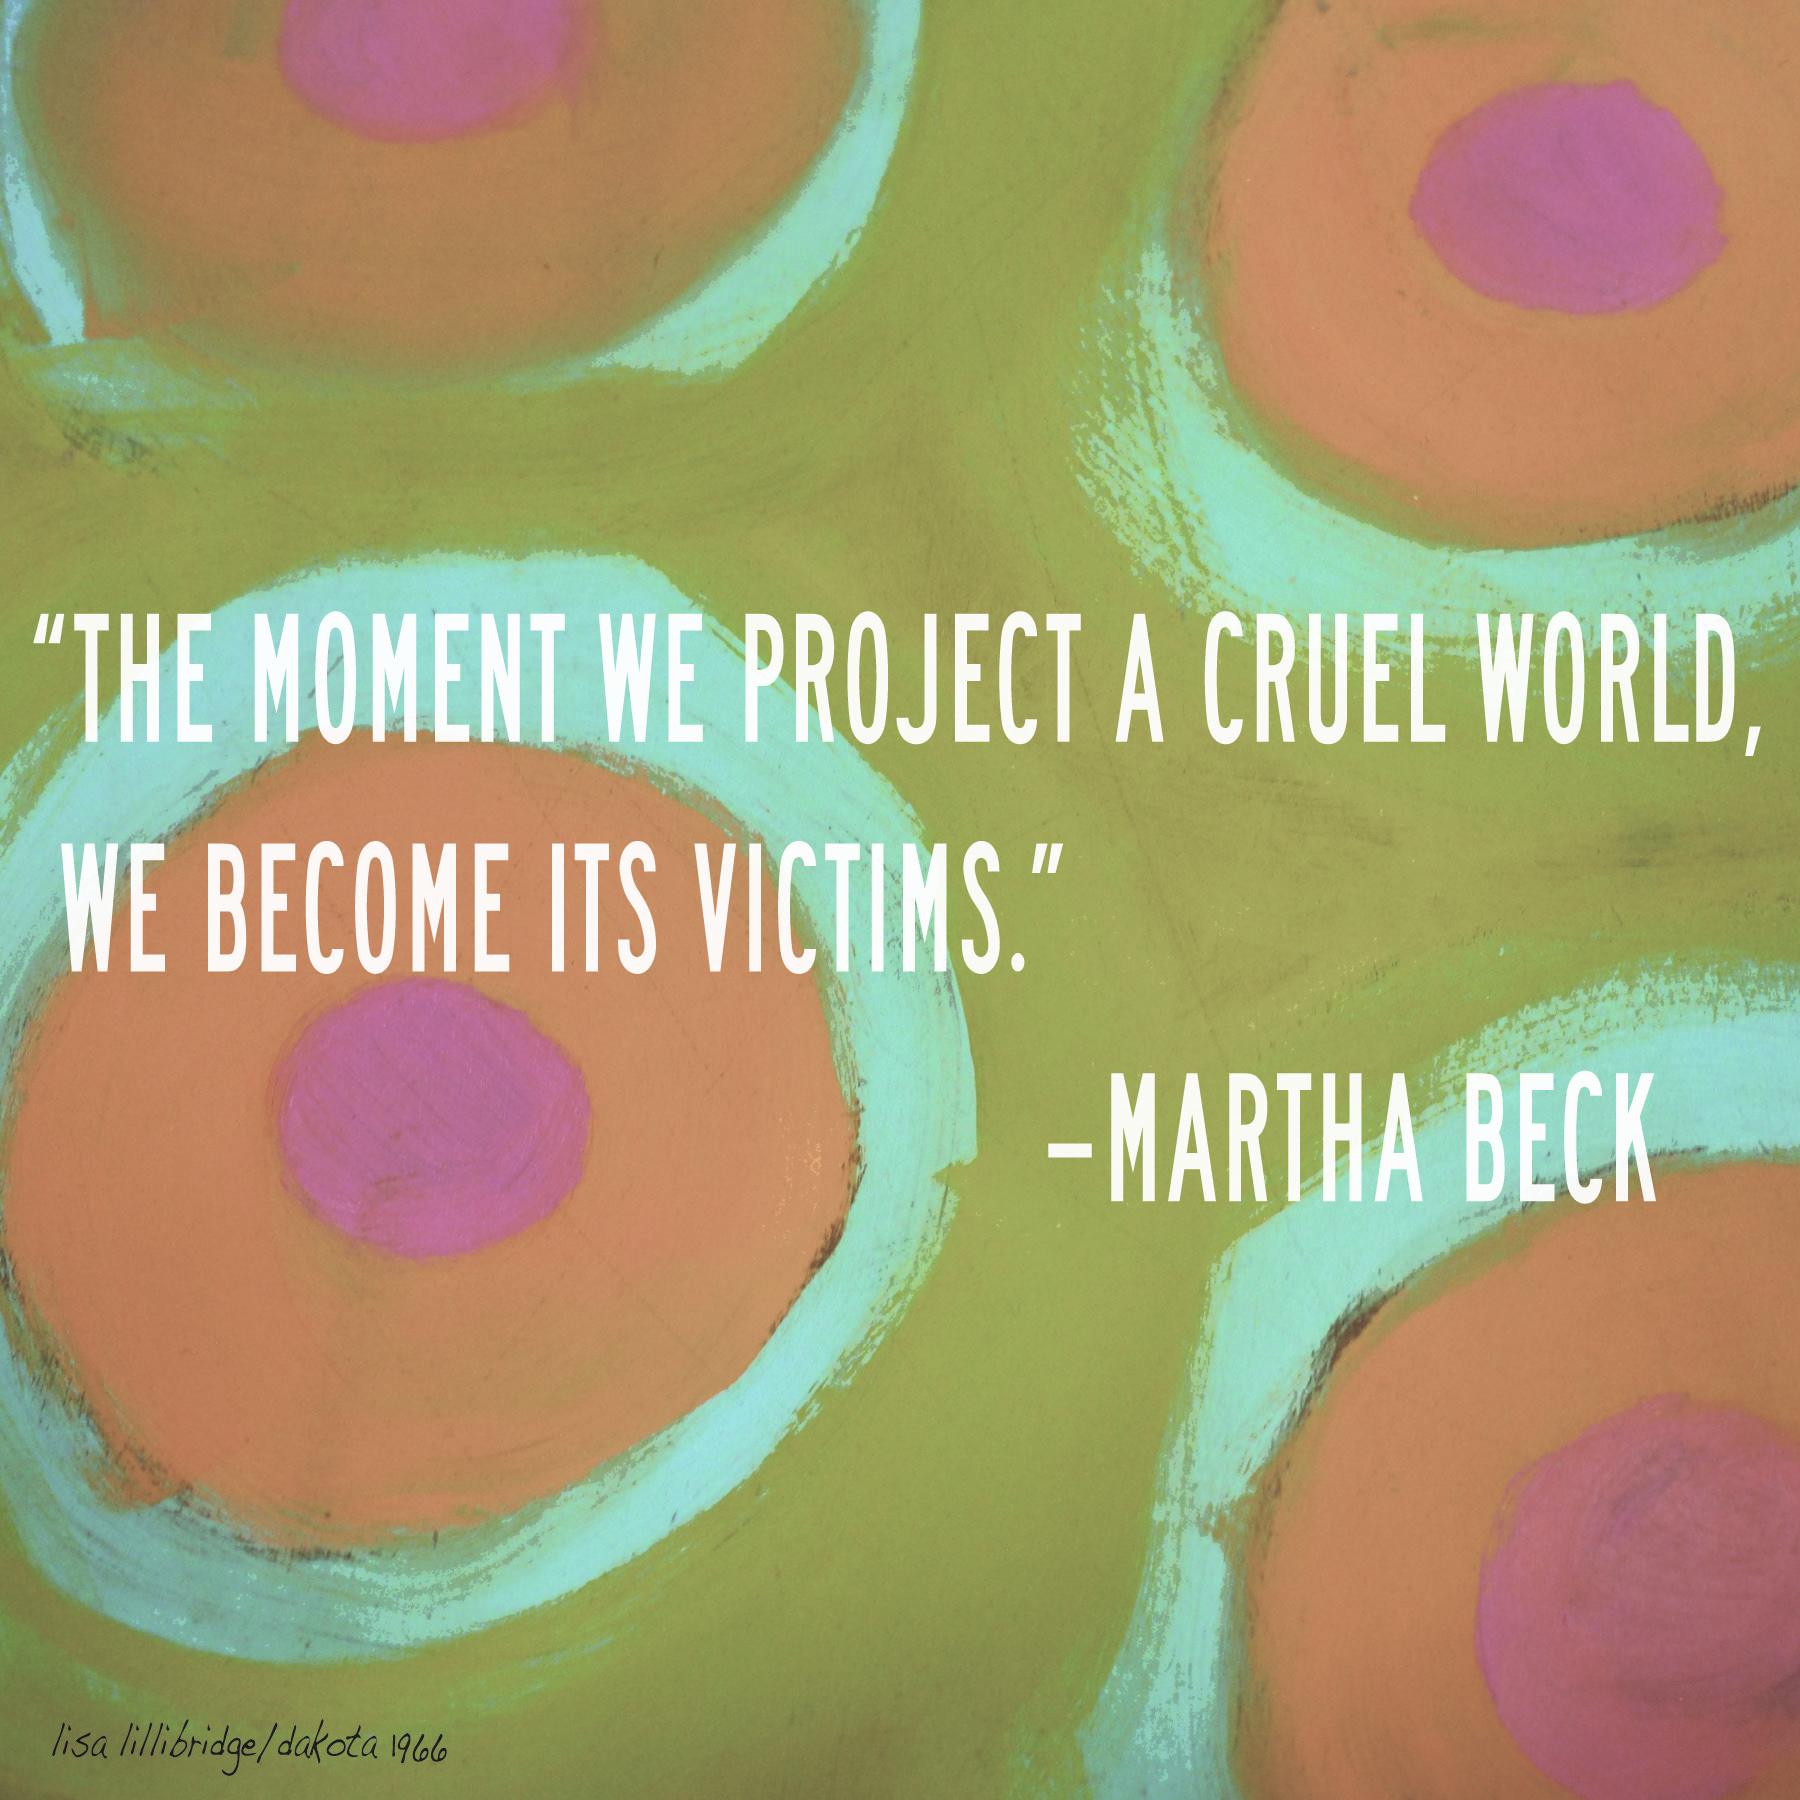 martha-beck-victims-quote-lisa-lillibridge